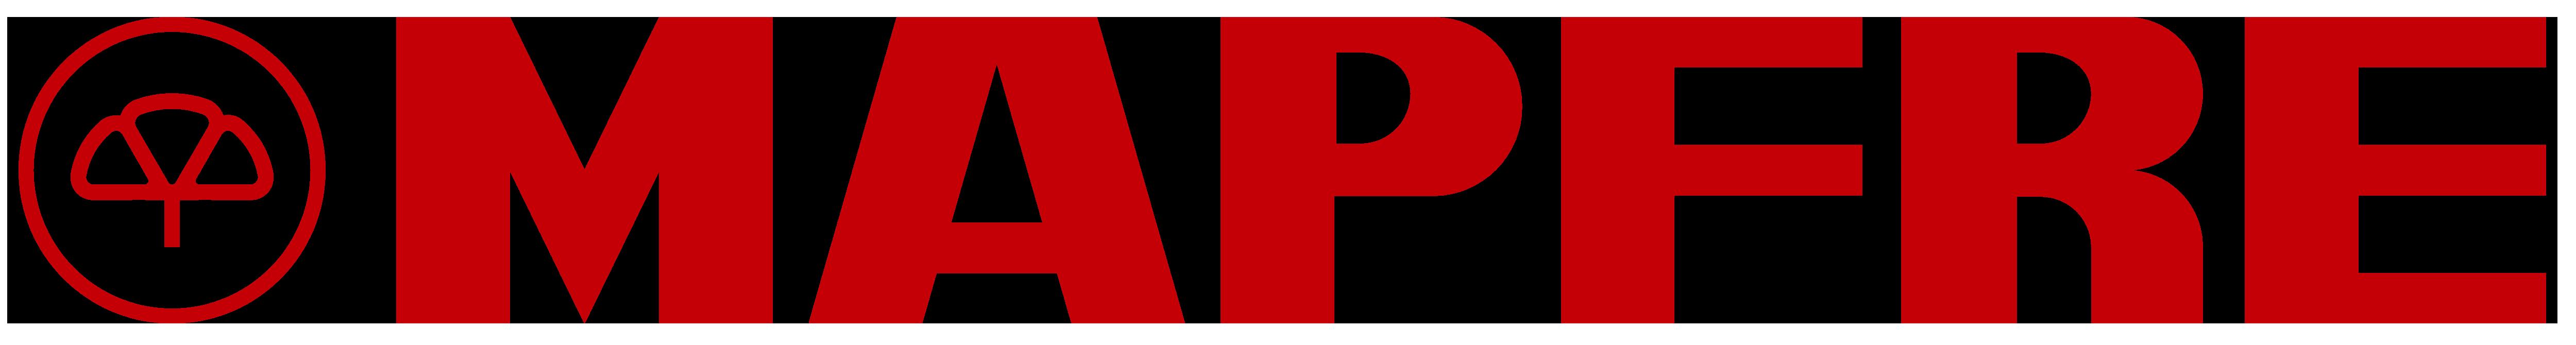 Mapfre Logos Download